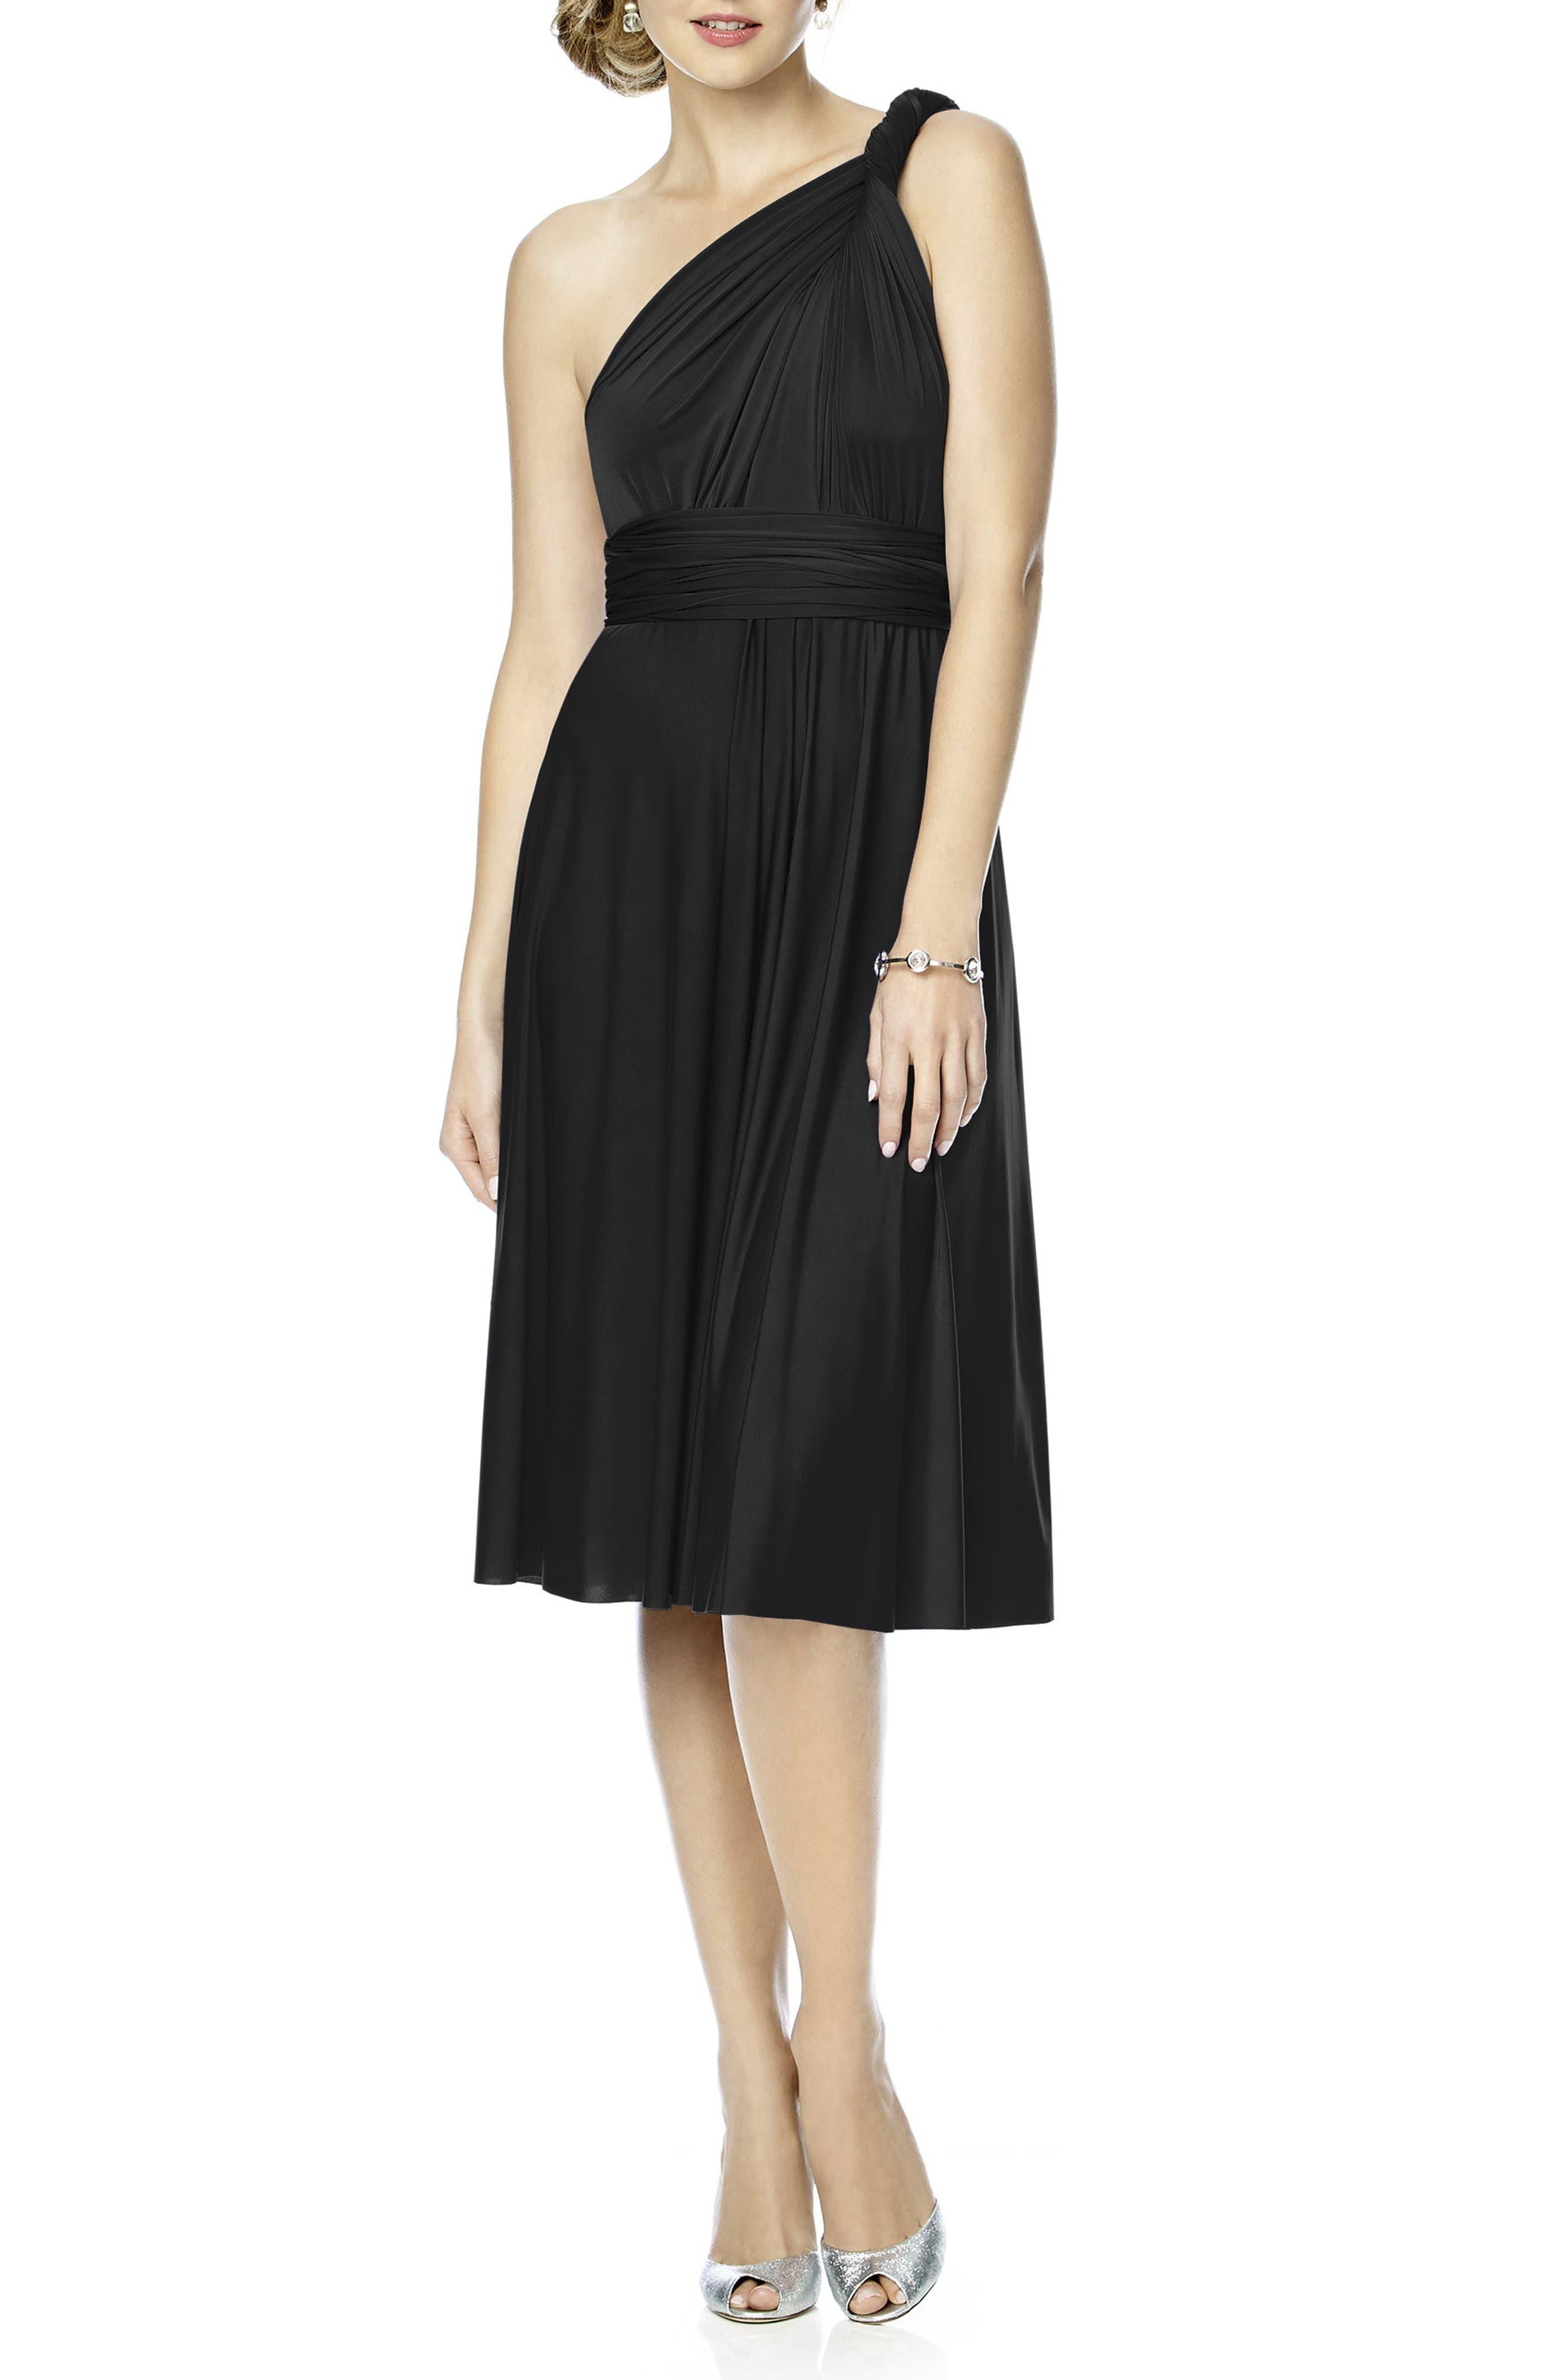 DESSY COLLECTION, Convertible Wrap Tie Surplice Jersey Dress, Alternate thumbnail 4, color, 001